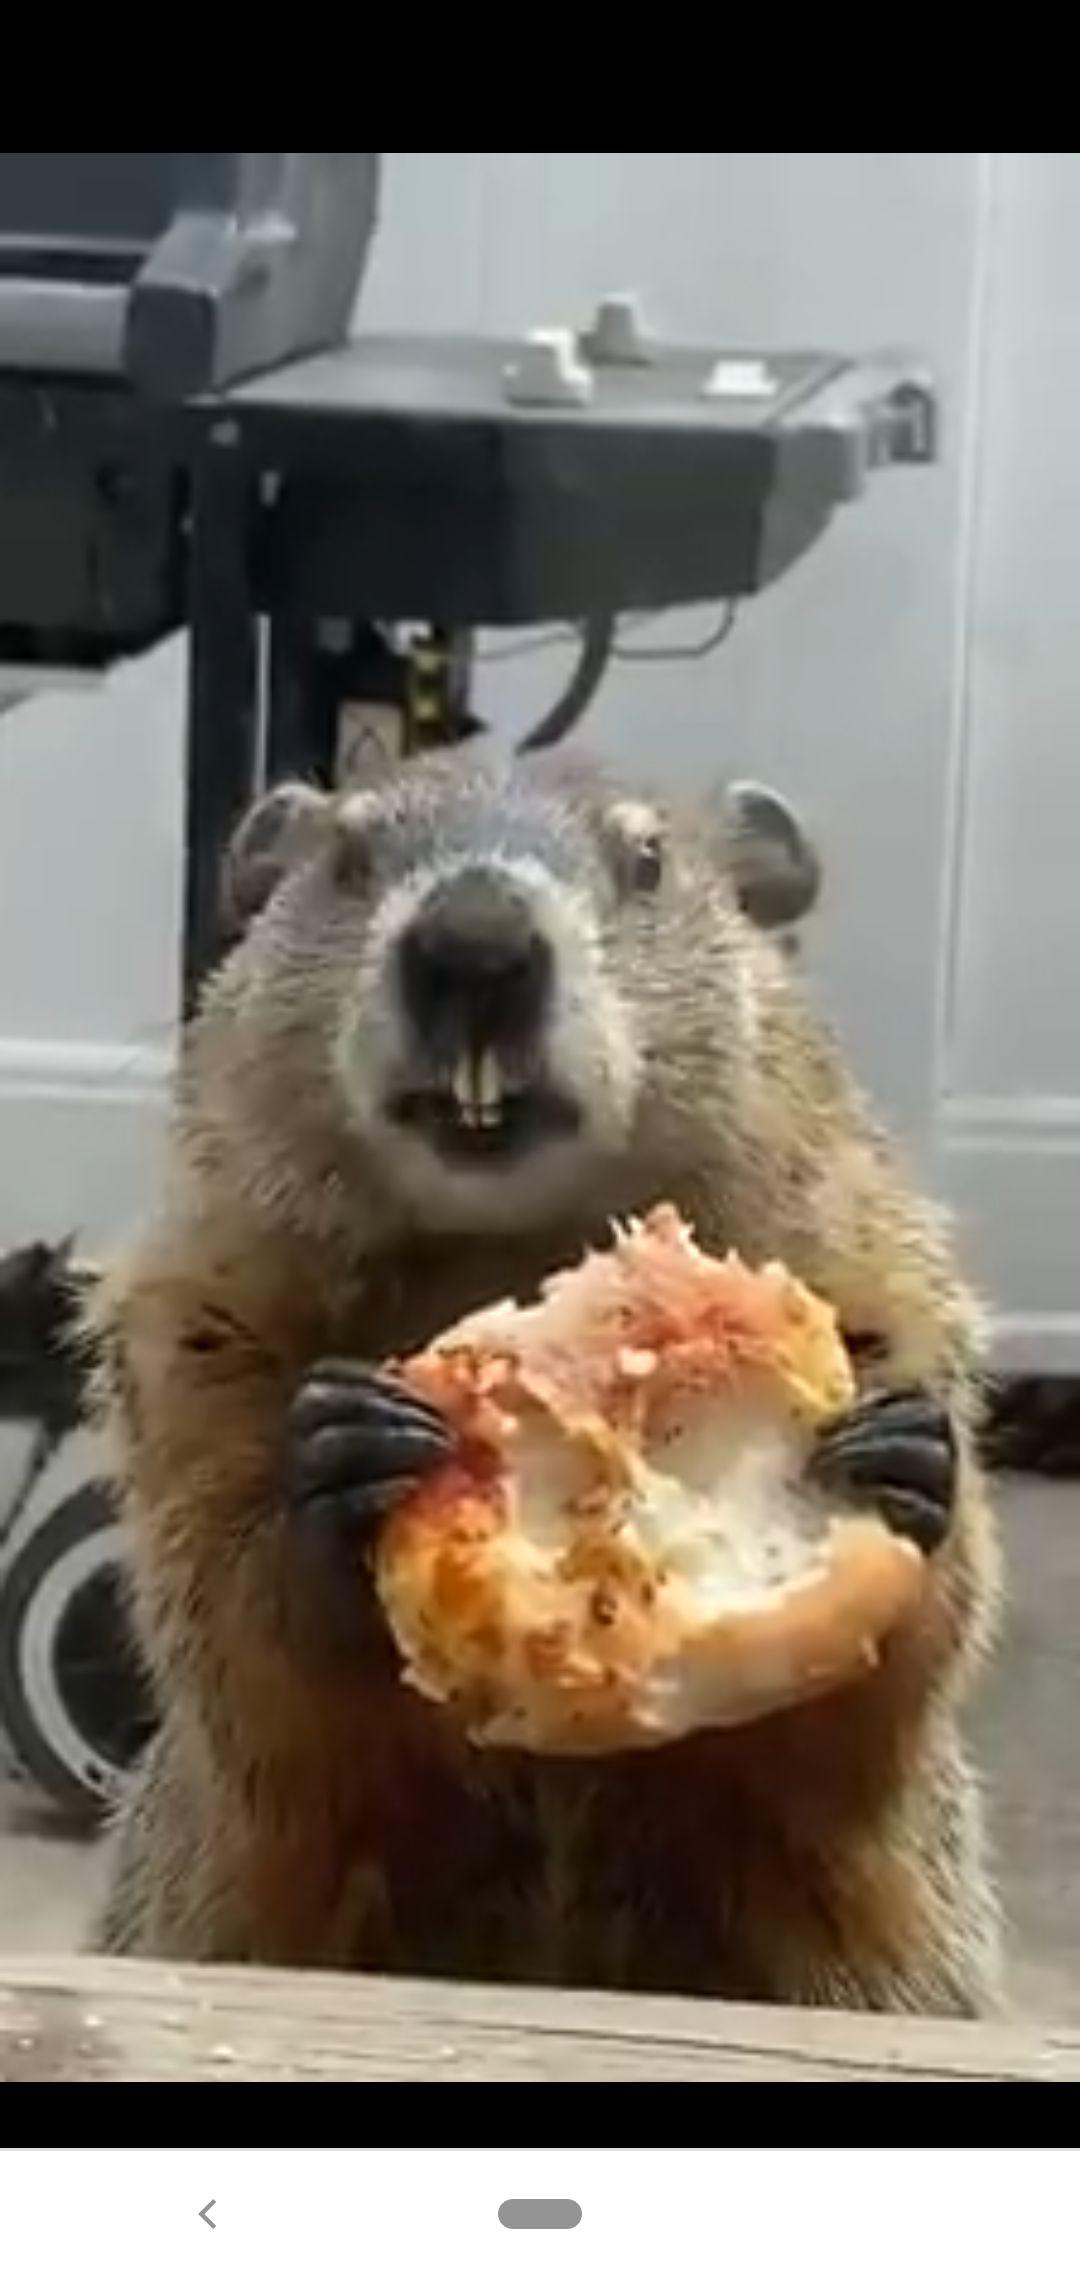 marmot makan pizza